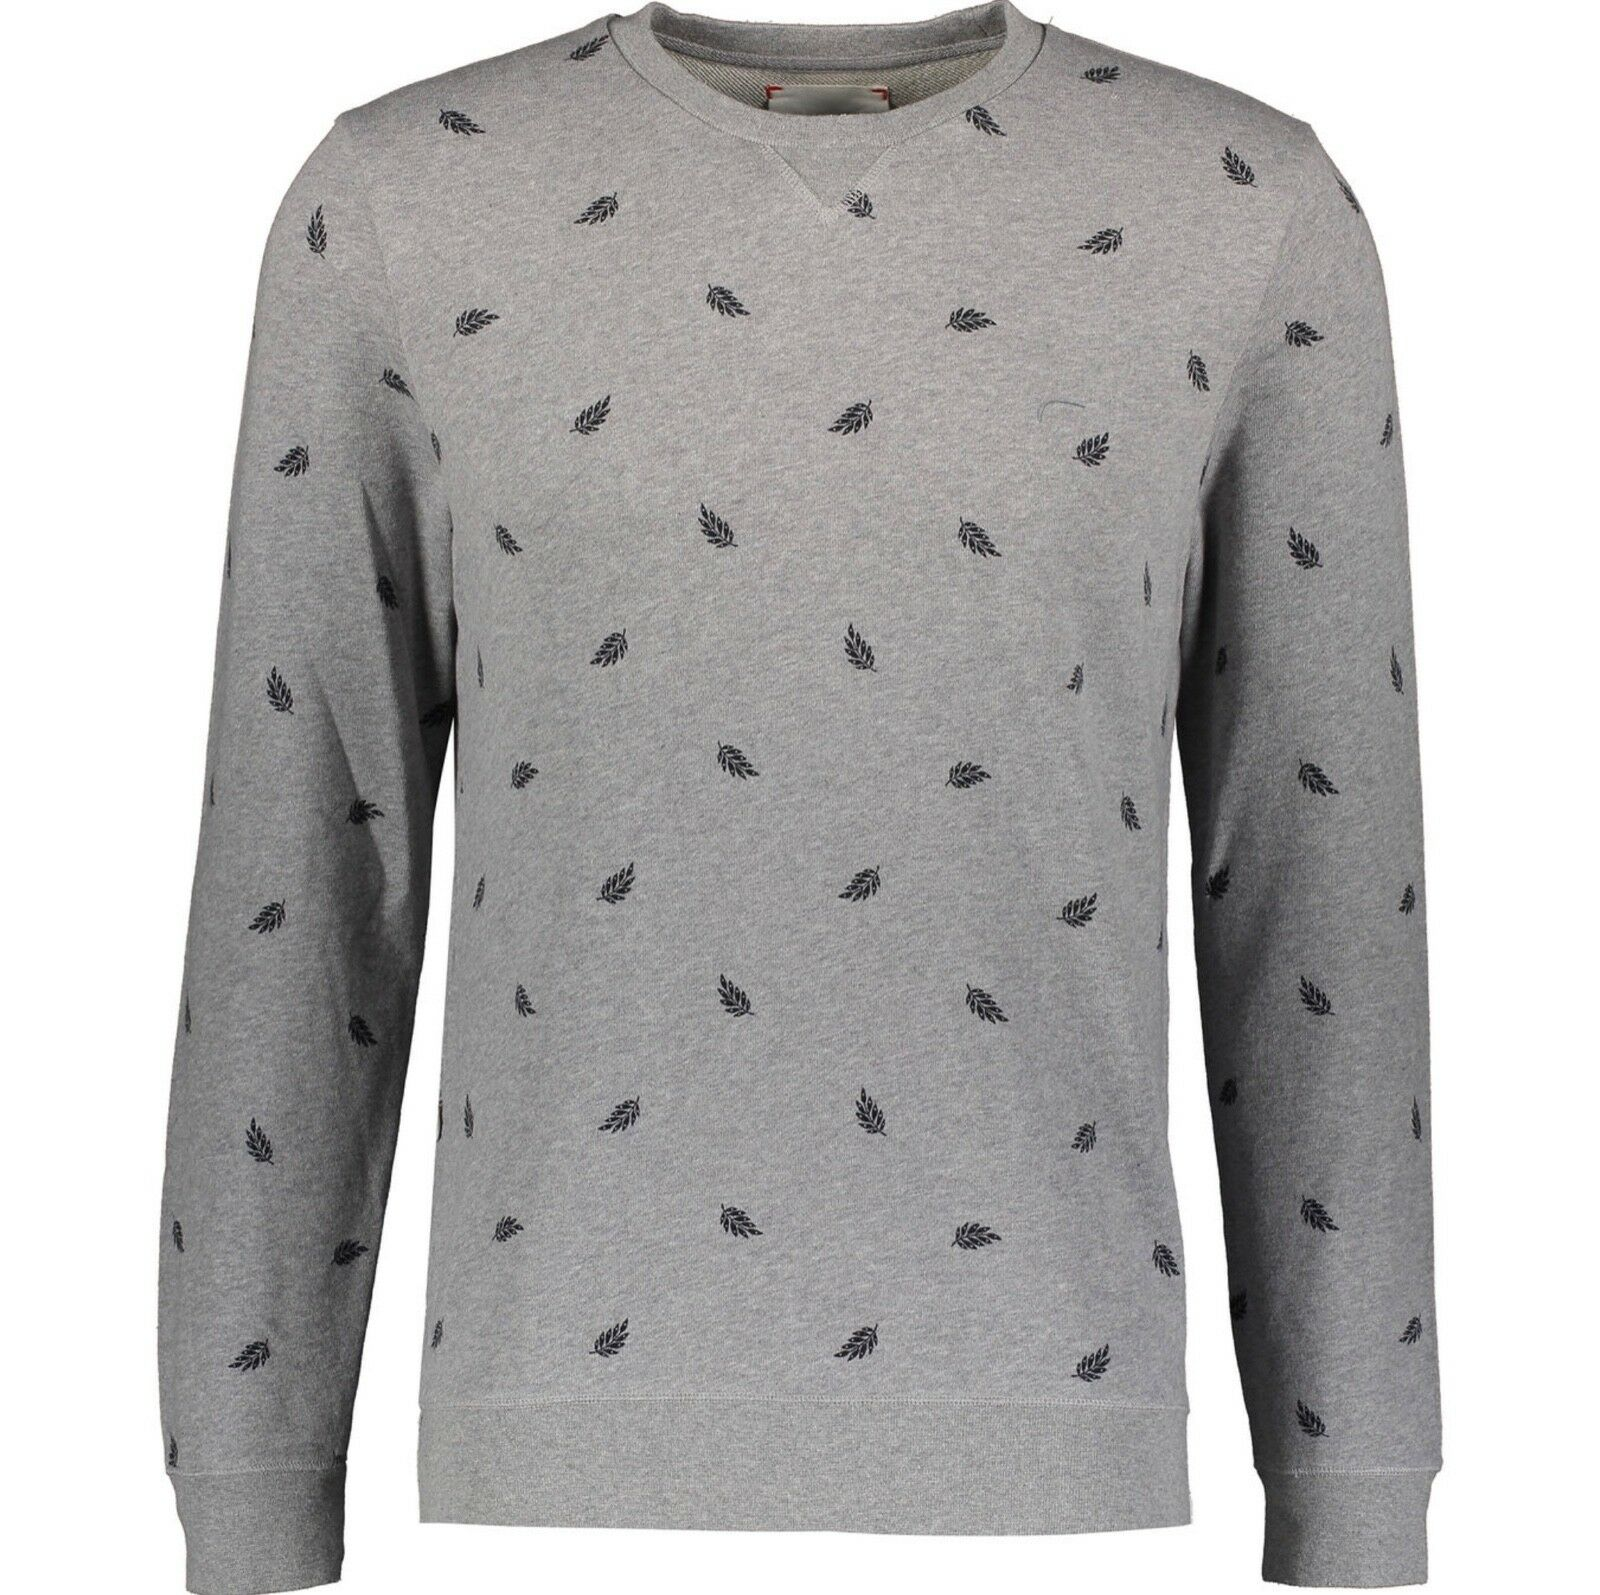 Herren Sweatshirt XL DEREK ROSE Light Grau Feather Print Cornwall UK 44 EU 54